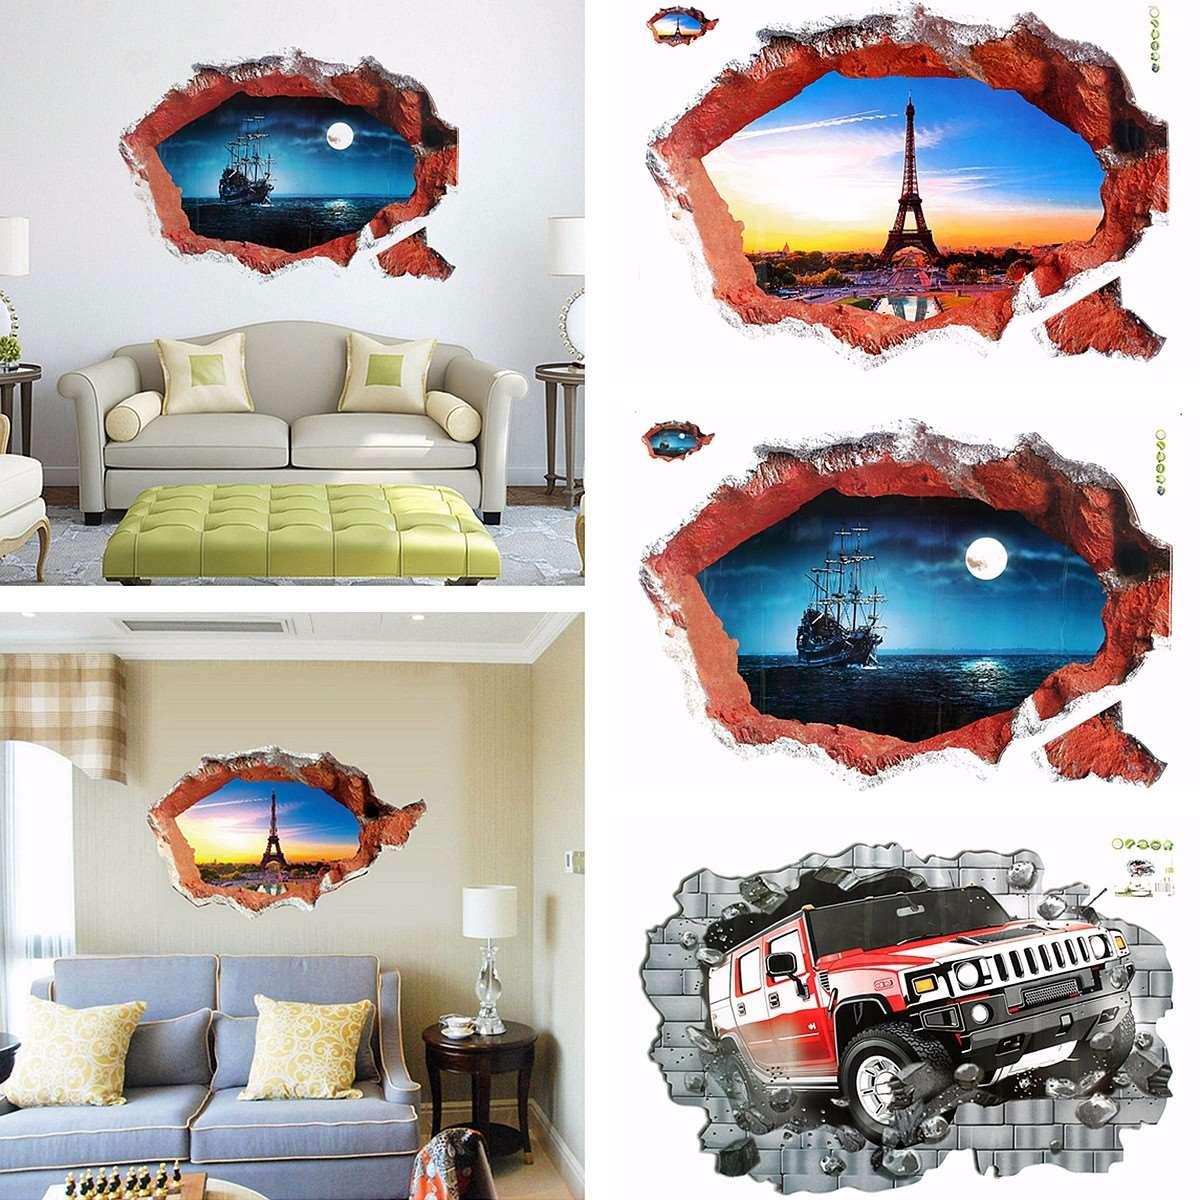 Online Get Cheap Removable Wallpaper -Aliexpress.com | Alibaba Group